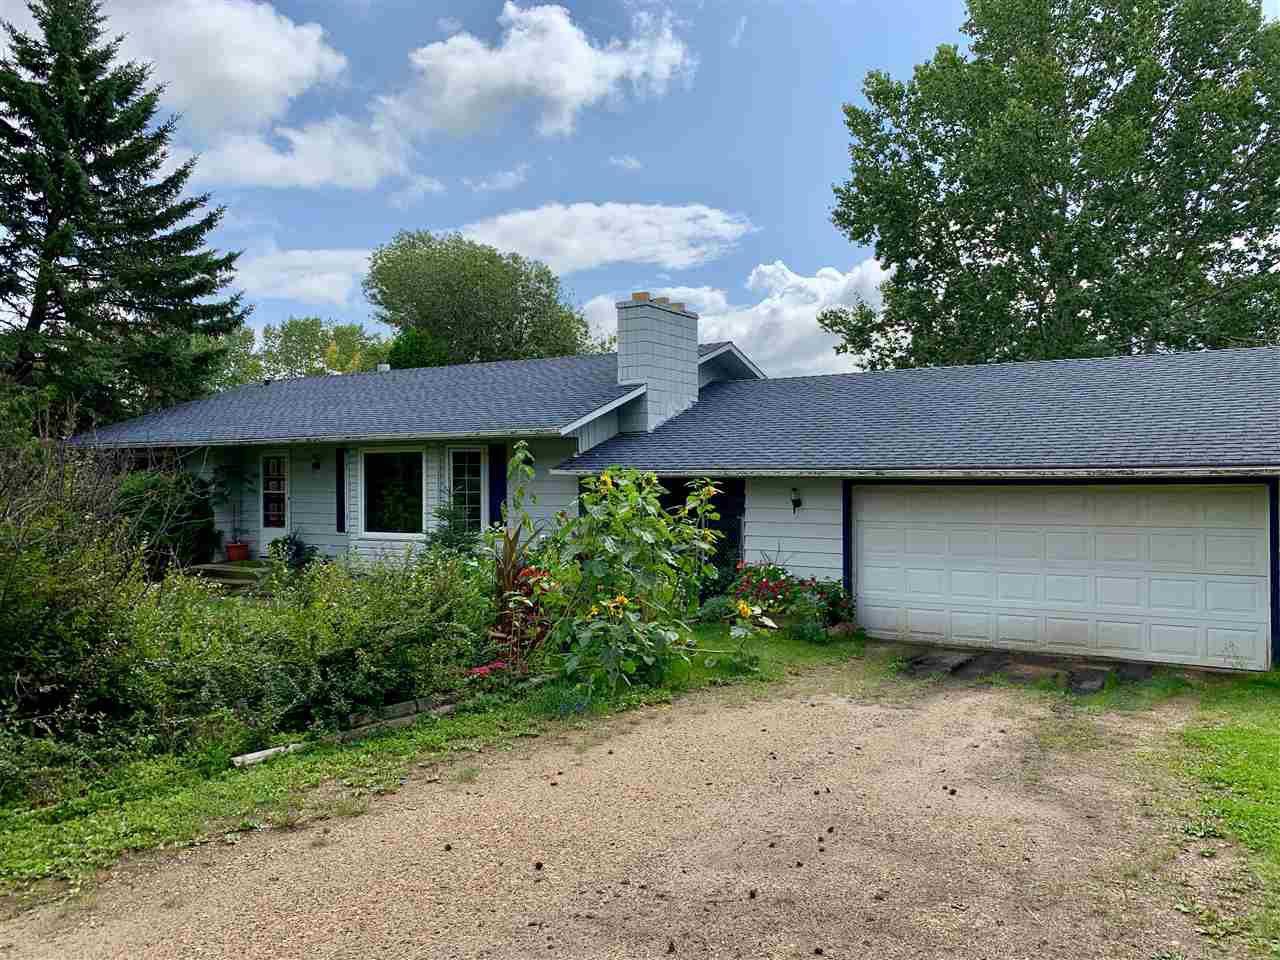 Main Photo: 51 SHULTZ Drive: Rural Sturgeon County House for sale : MLS®# E4189992